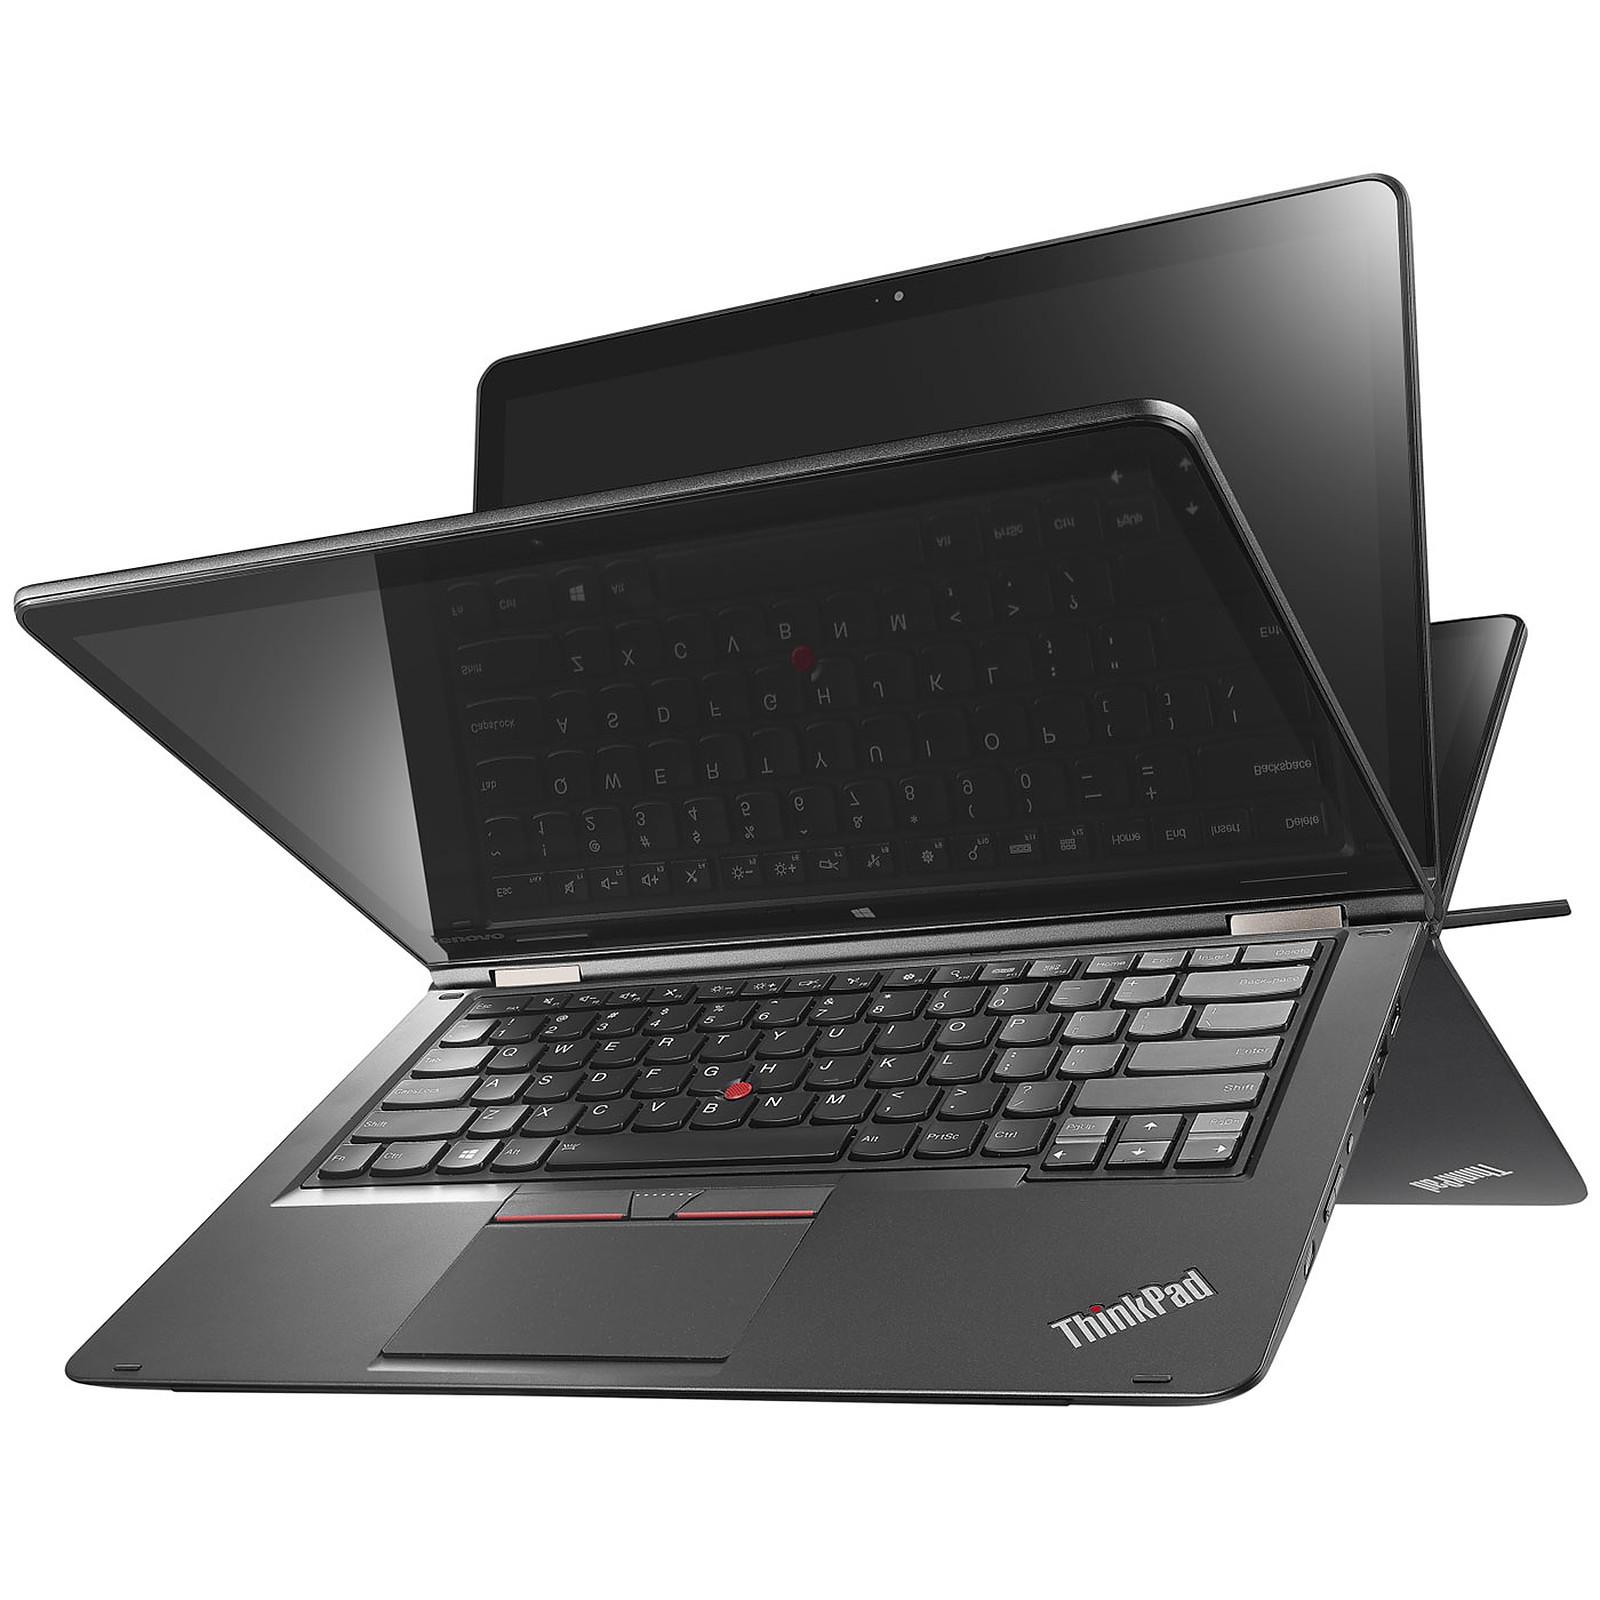 Lenovo ThinkPad Yoga 14 (20DM009LFR)